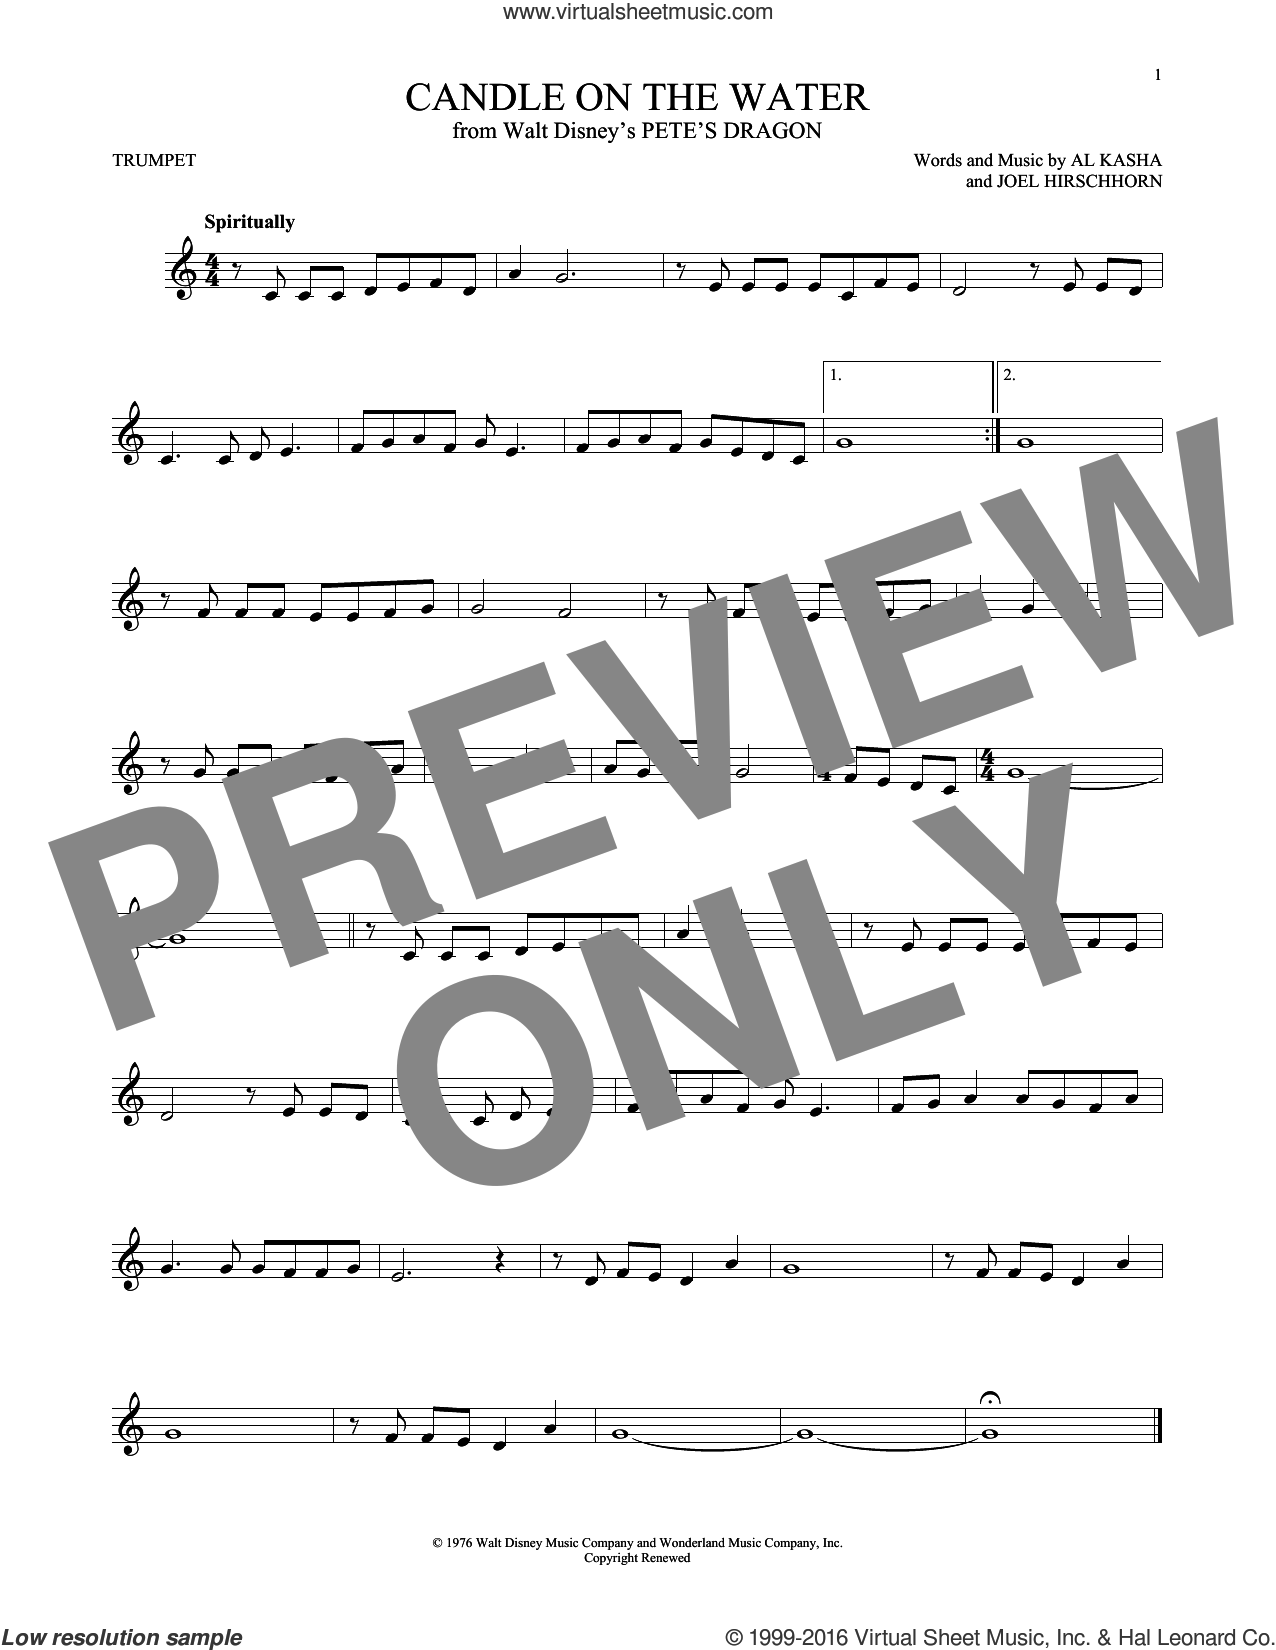 Candle On The Water sheet music for trumpet solo by Al Kasha, Al Kasha & Joel Hirschhorn and Joel Hirschhorn, intermediate skill level